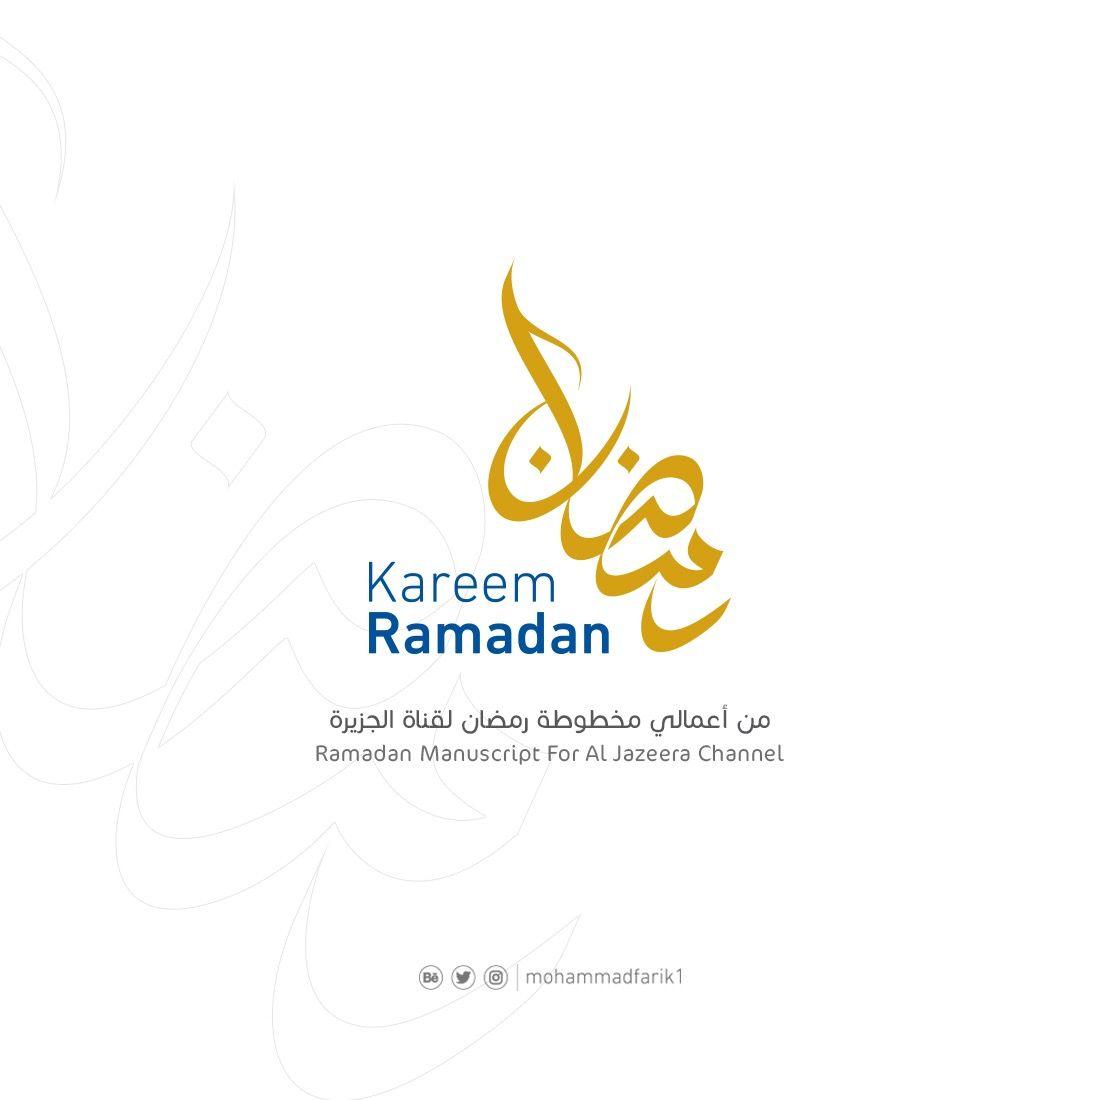 رمضان كريم Ramadan Kareem Ramadan Arabic Calligraphy Logo